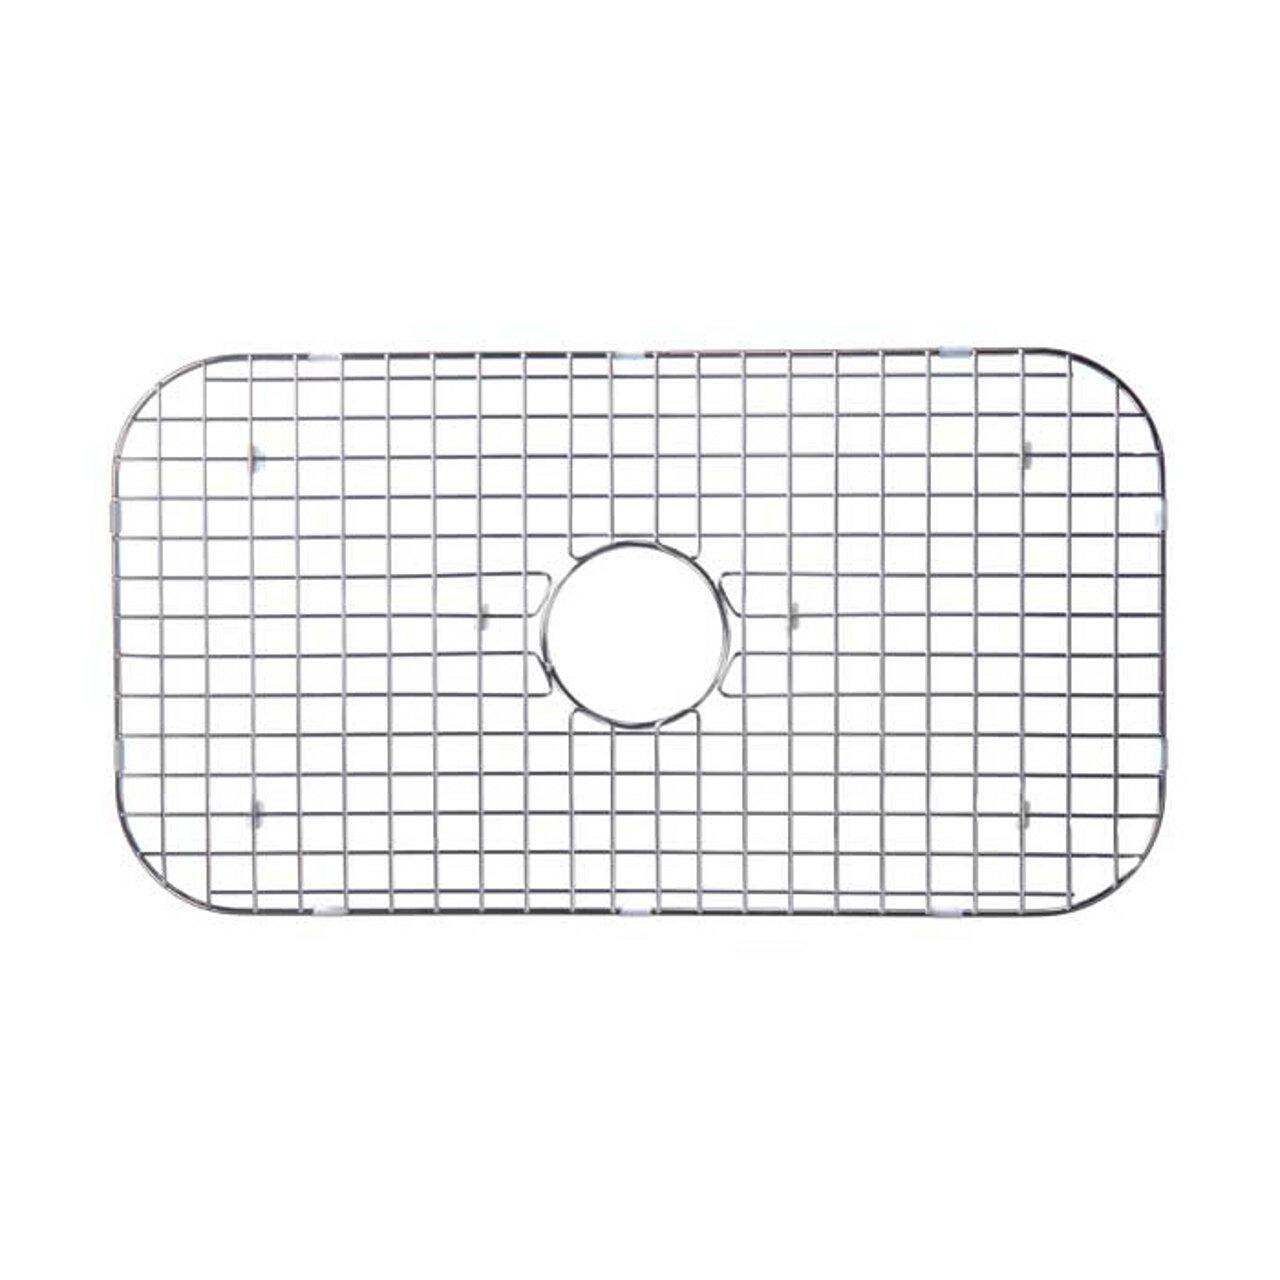 Artisan BG-26 26-Inch by 14-Inch Sink Rack